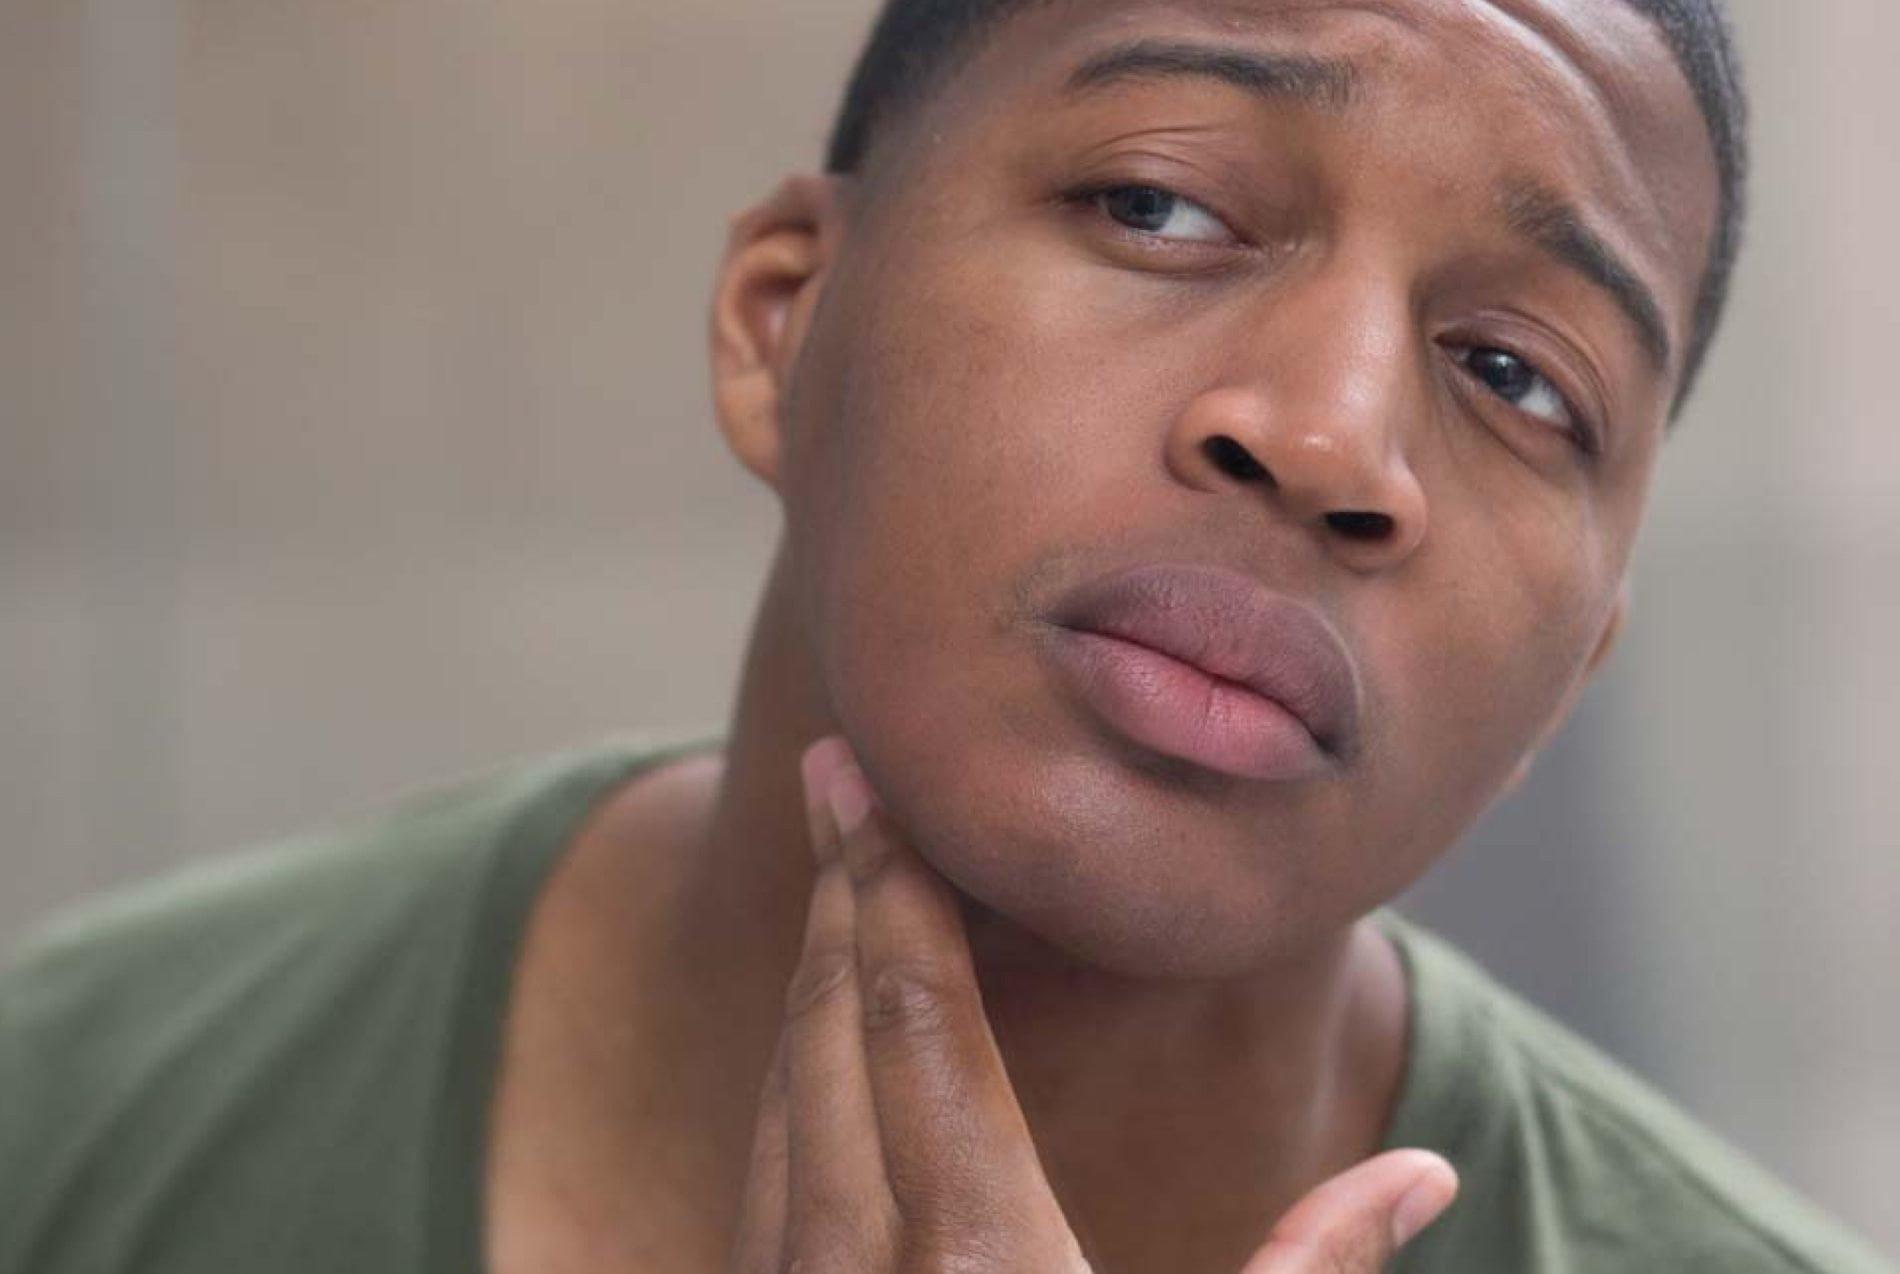 Razor Bumps Symptoms And Causes